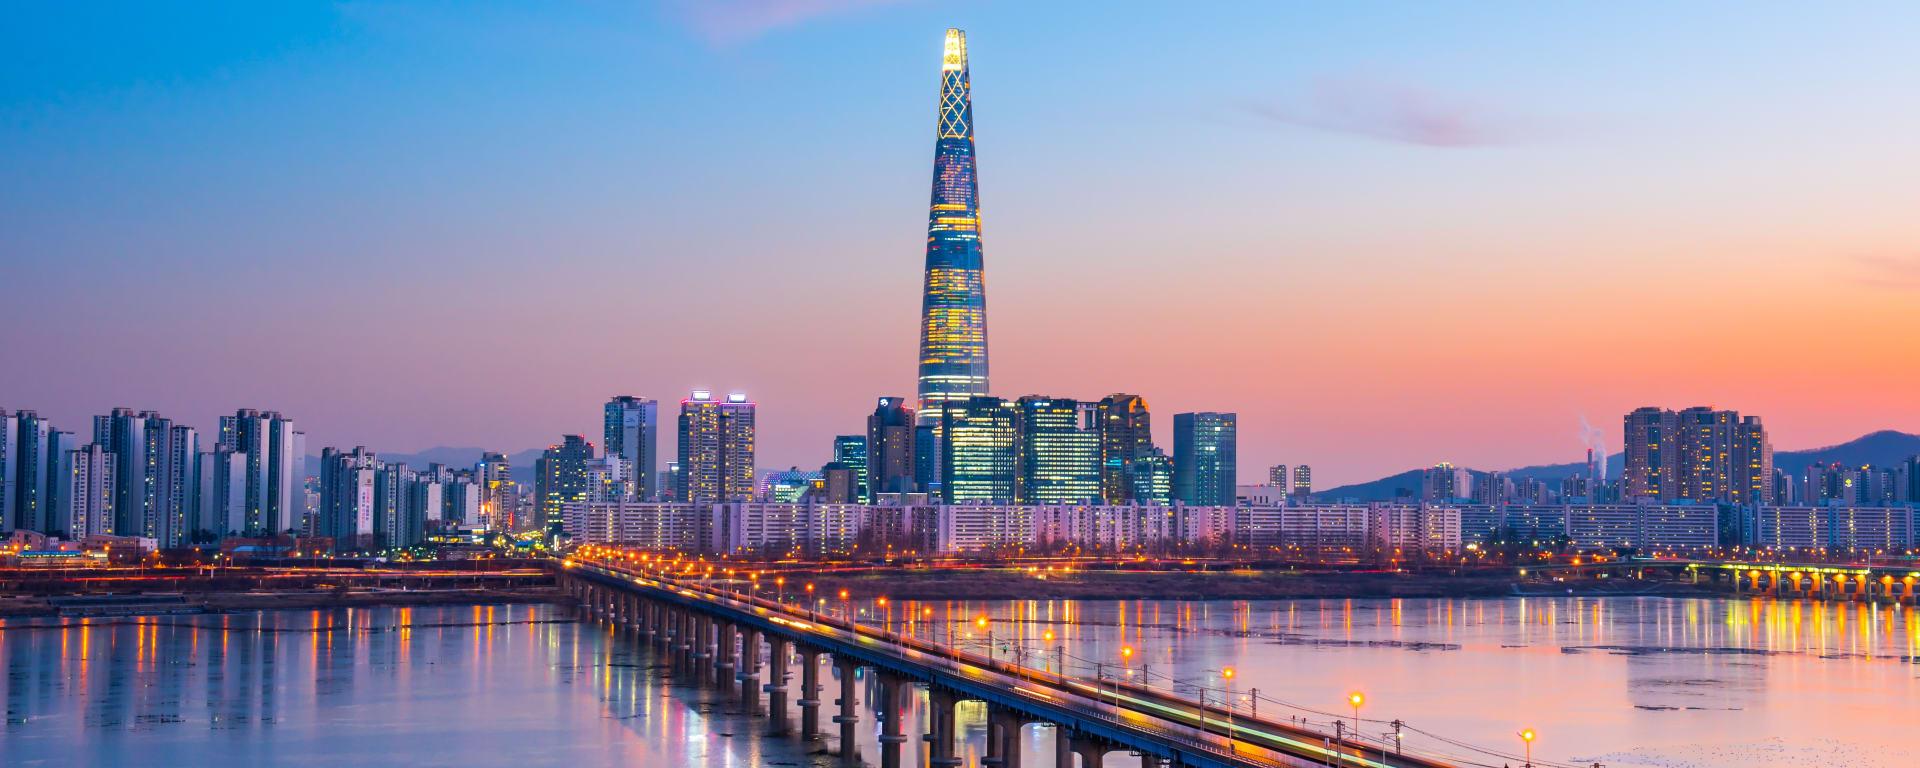 Südkorea entdecken mit Tischler Reisen: Korea Seoul Han River Skyline